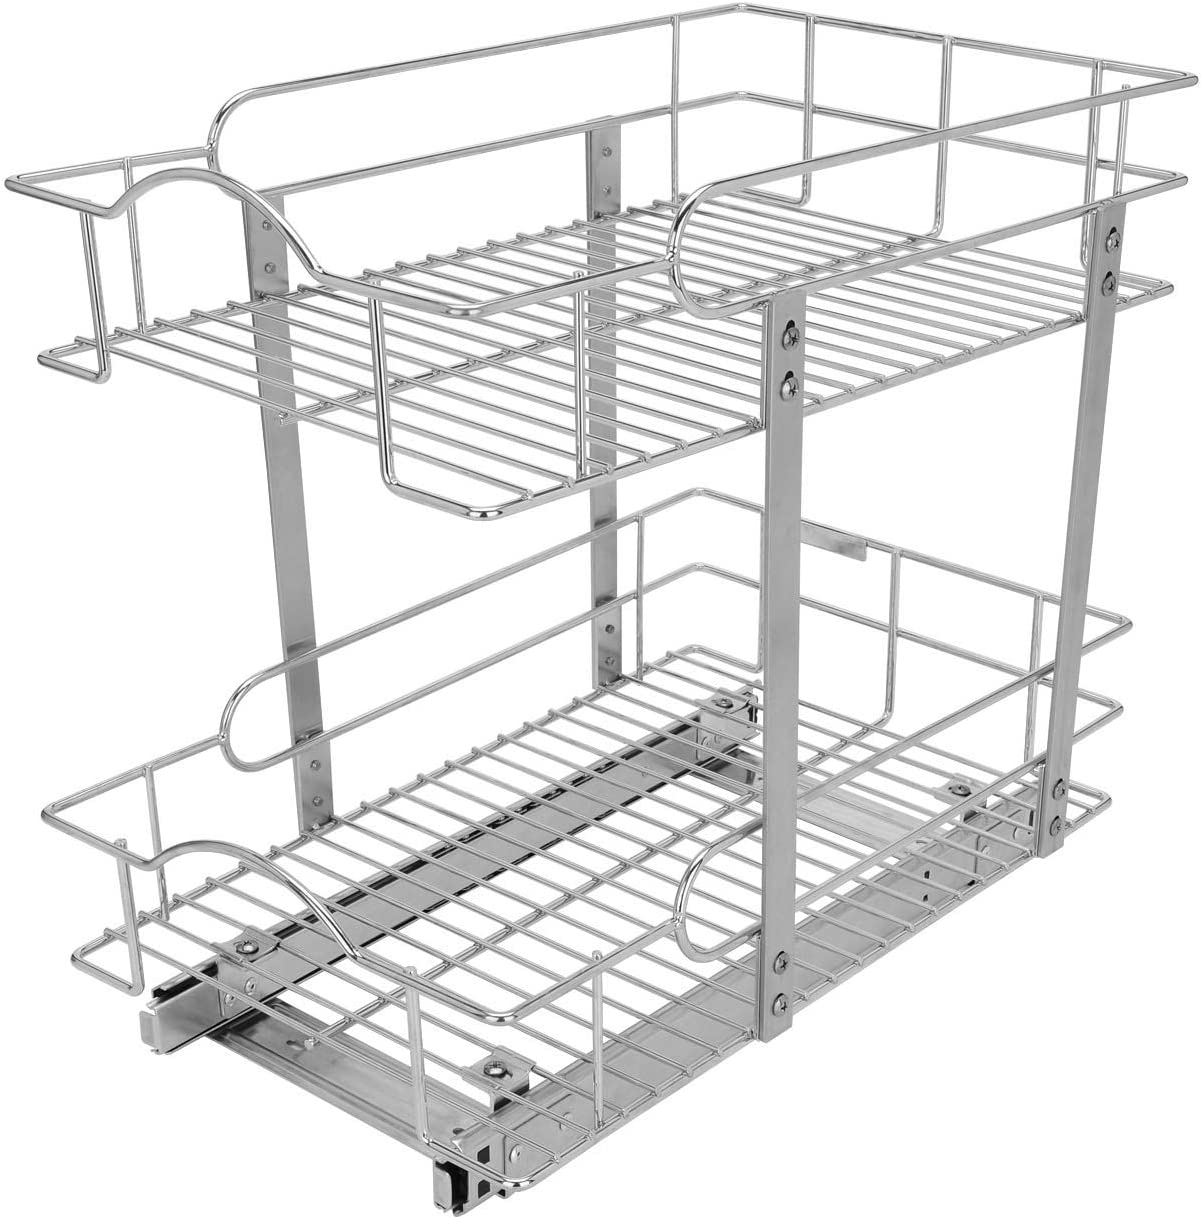 MorNon Slide Out Cabinet Organizer Pull Kitchen Cabi Sliding 正規取扱店 1年保証